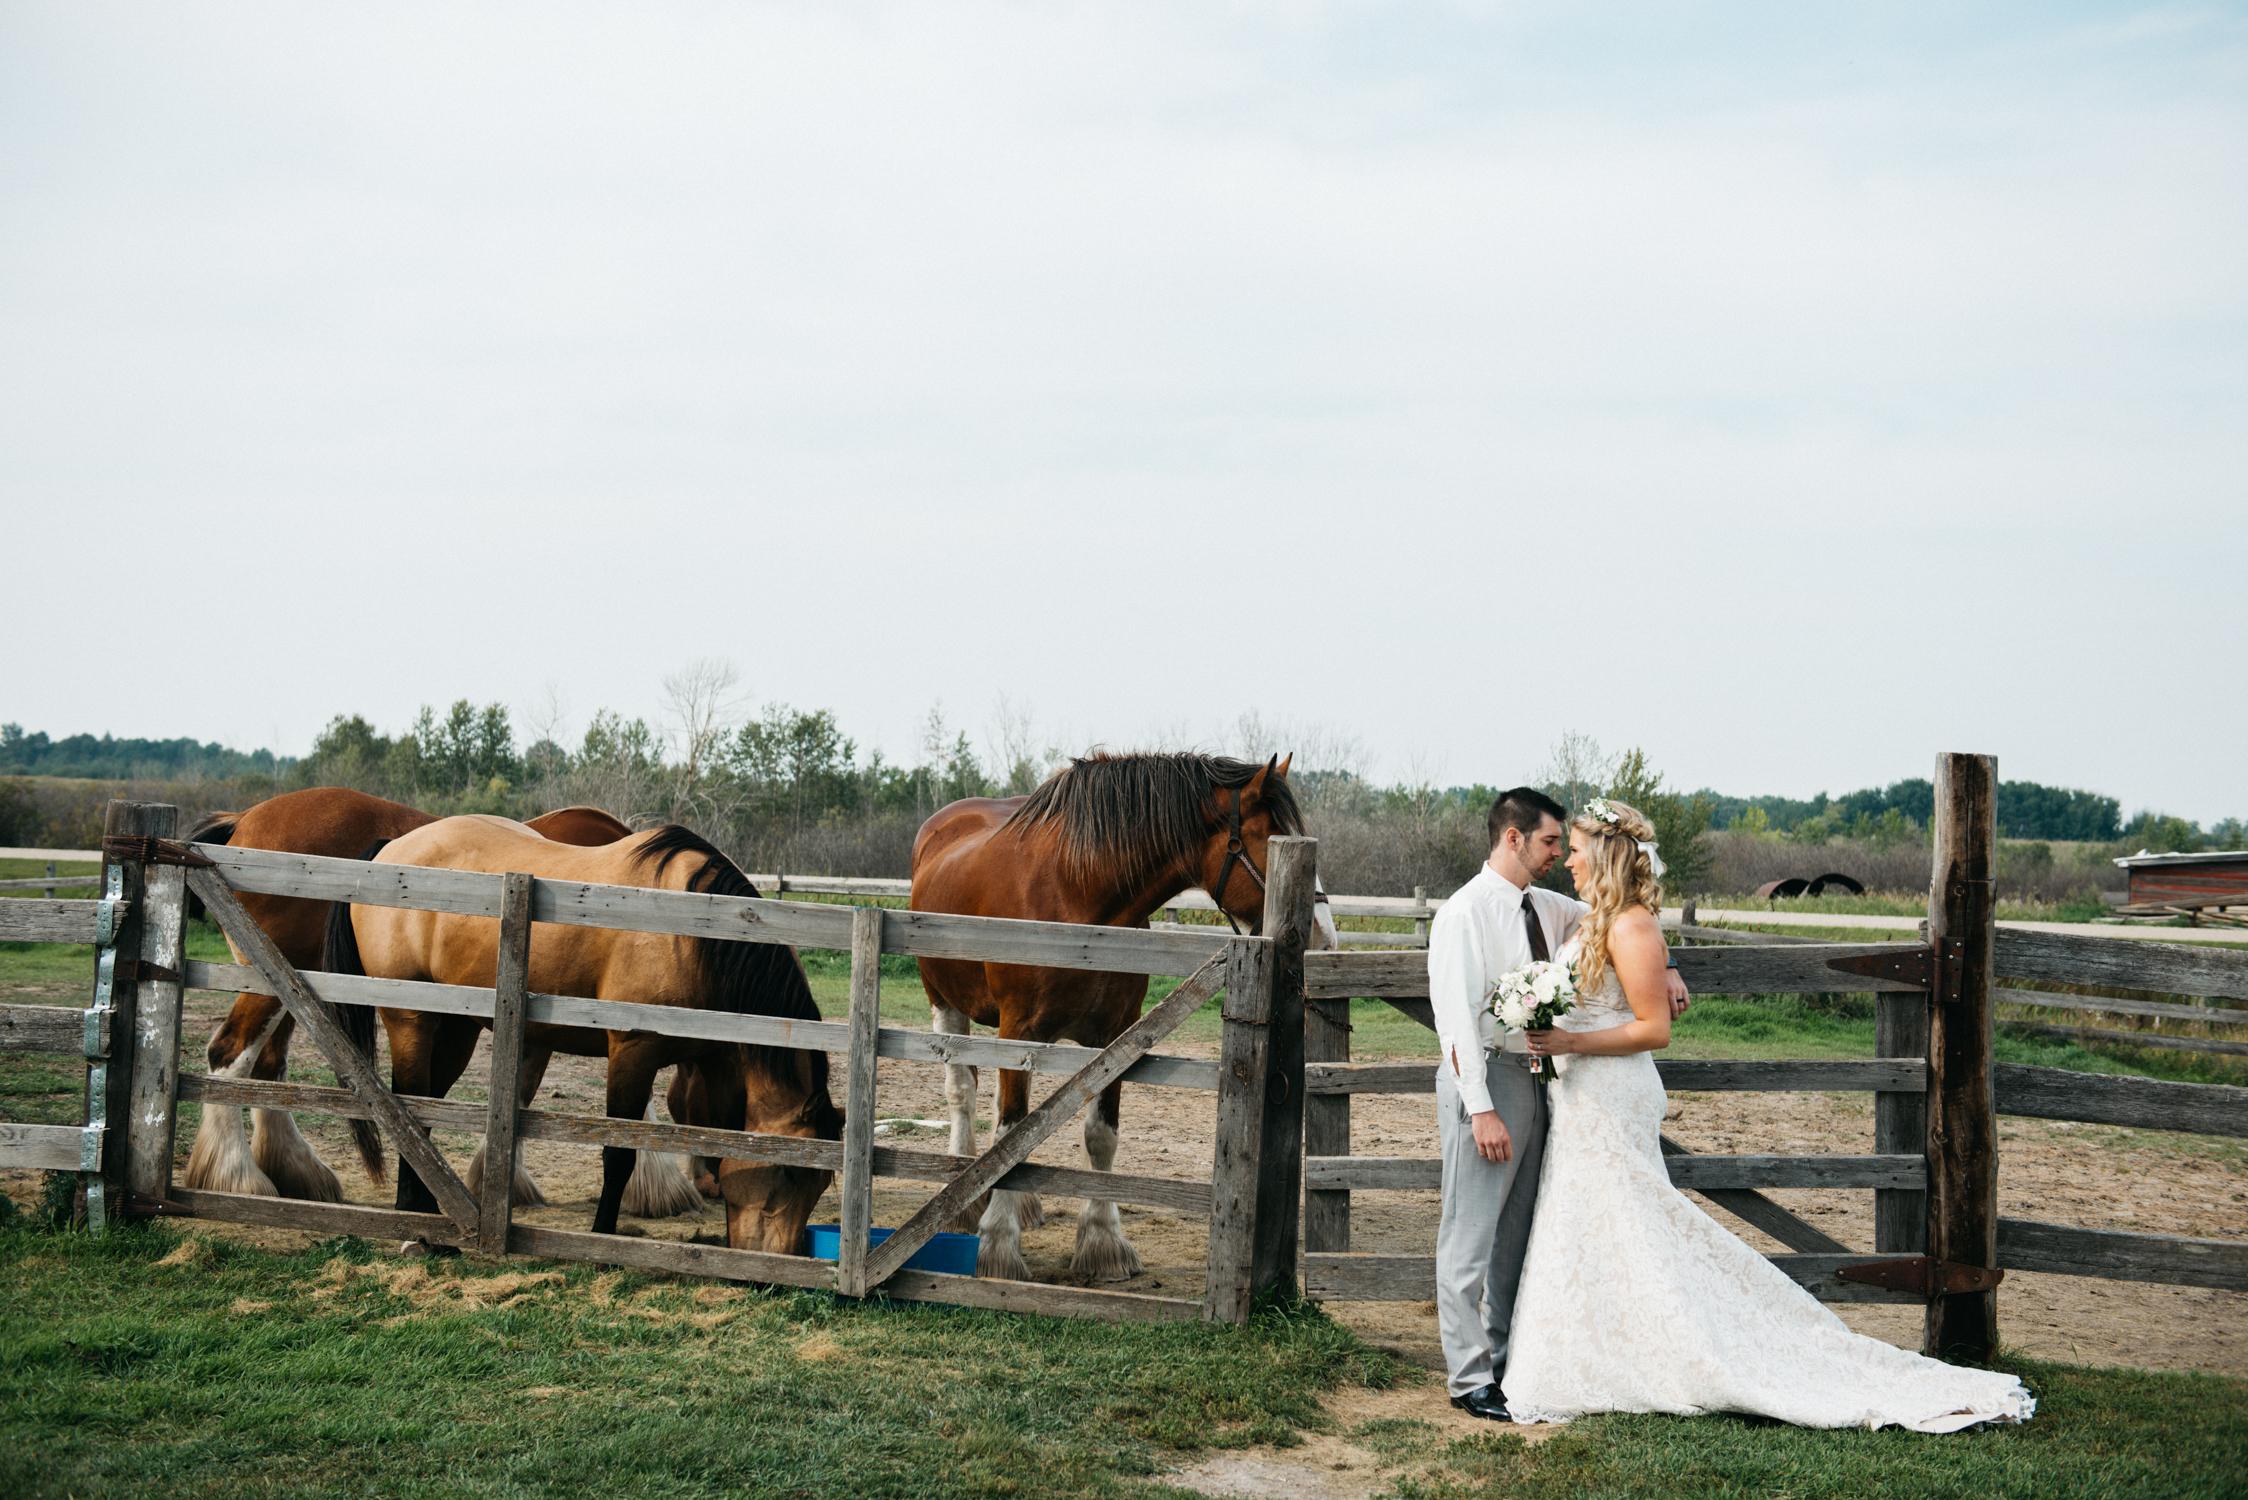 026_saskatoon_saskatchewan_small_town_wedding.jpg